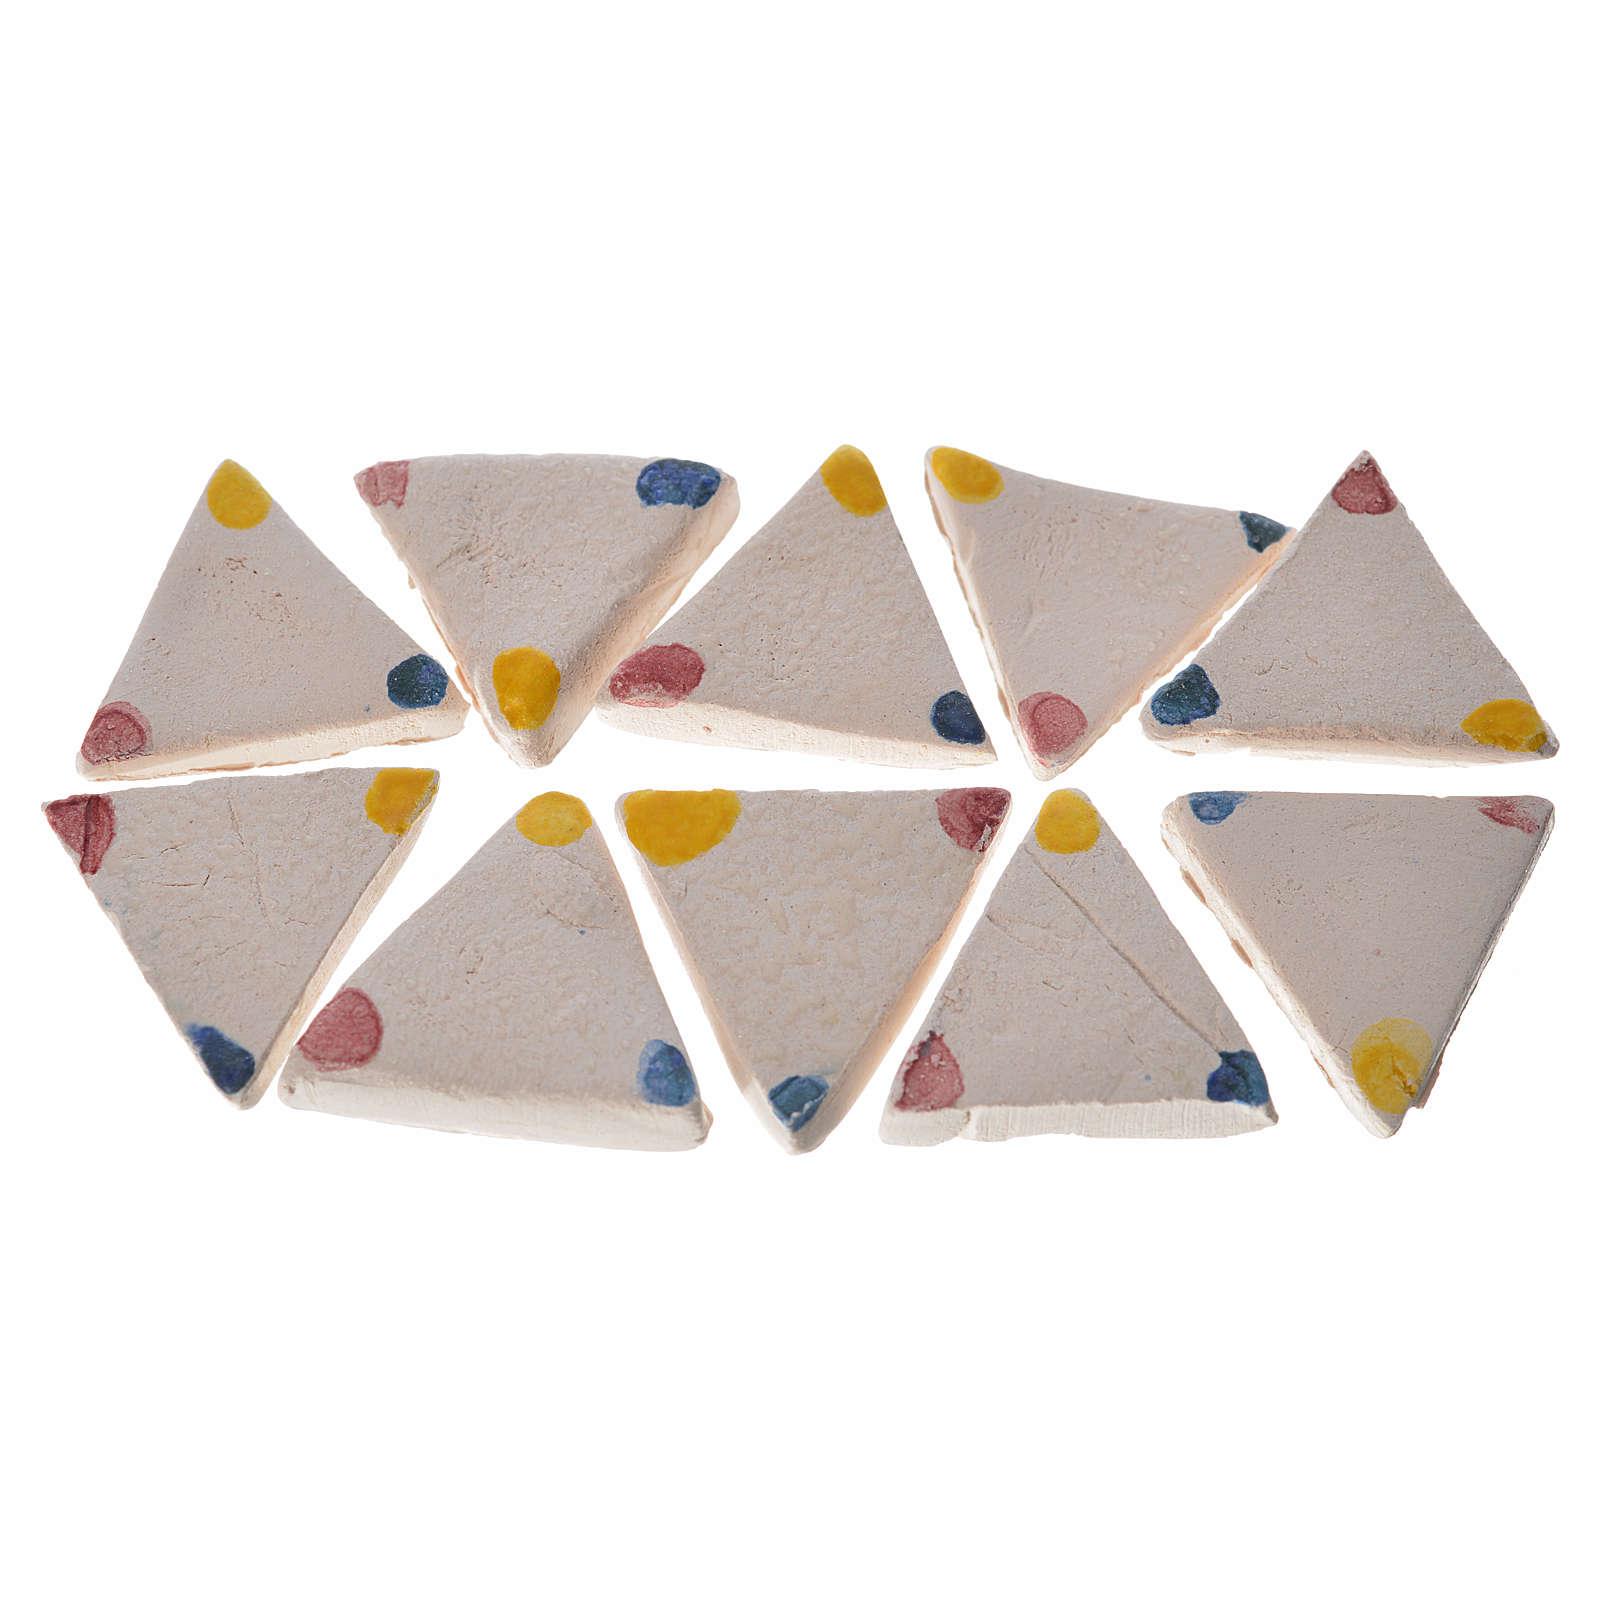 Nativity accessory, enamelled terracotta tiles, 60pcs, triangula 4